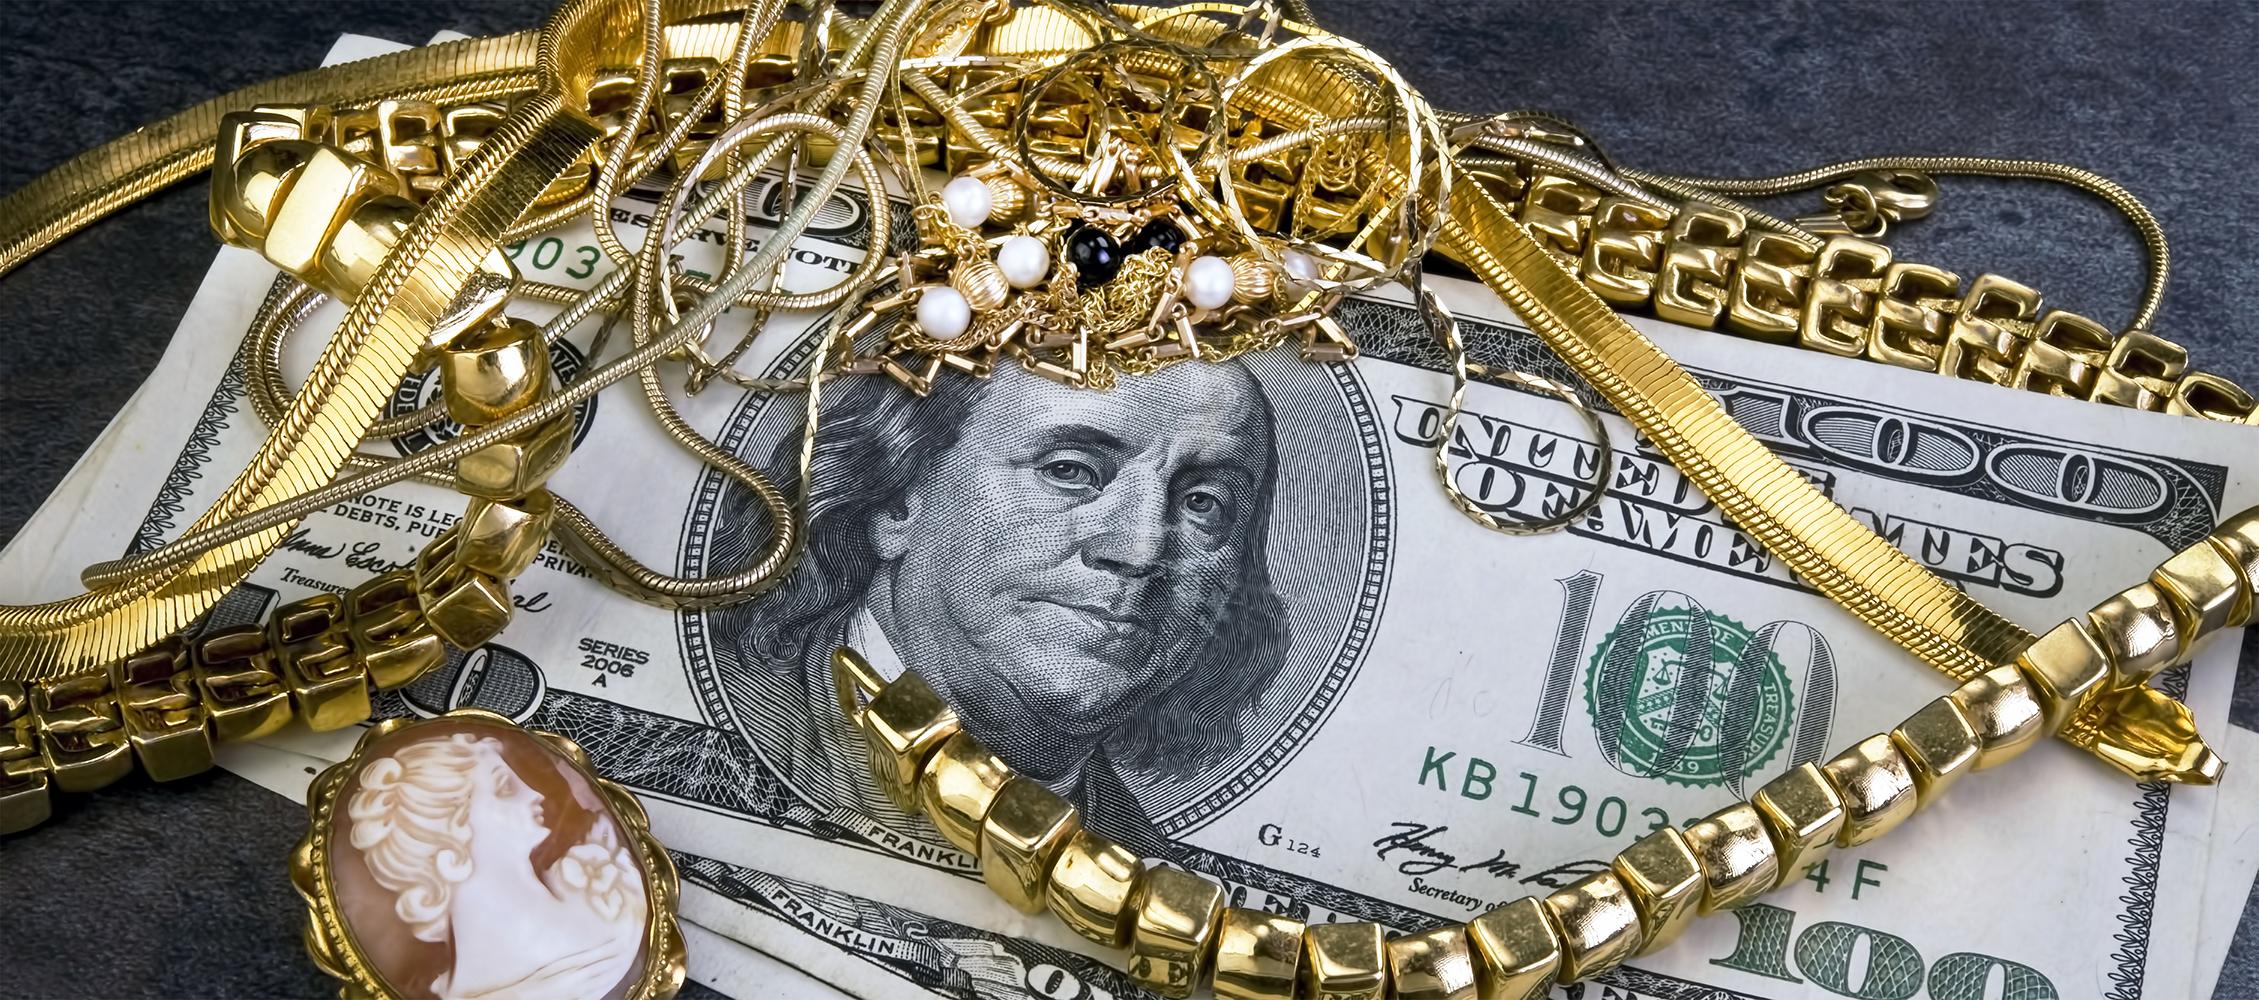 Coins/Paper Money